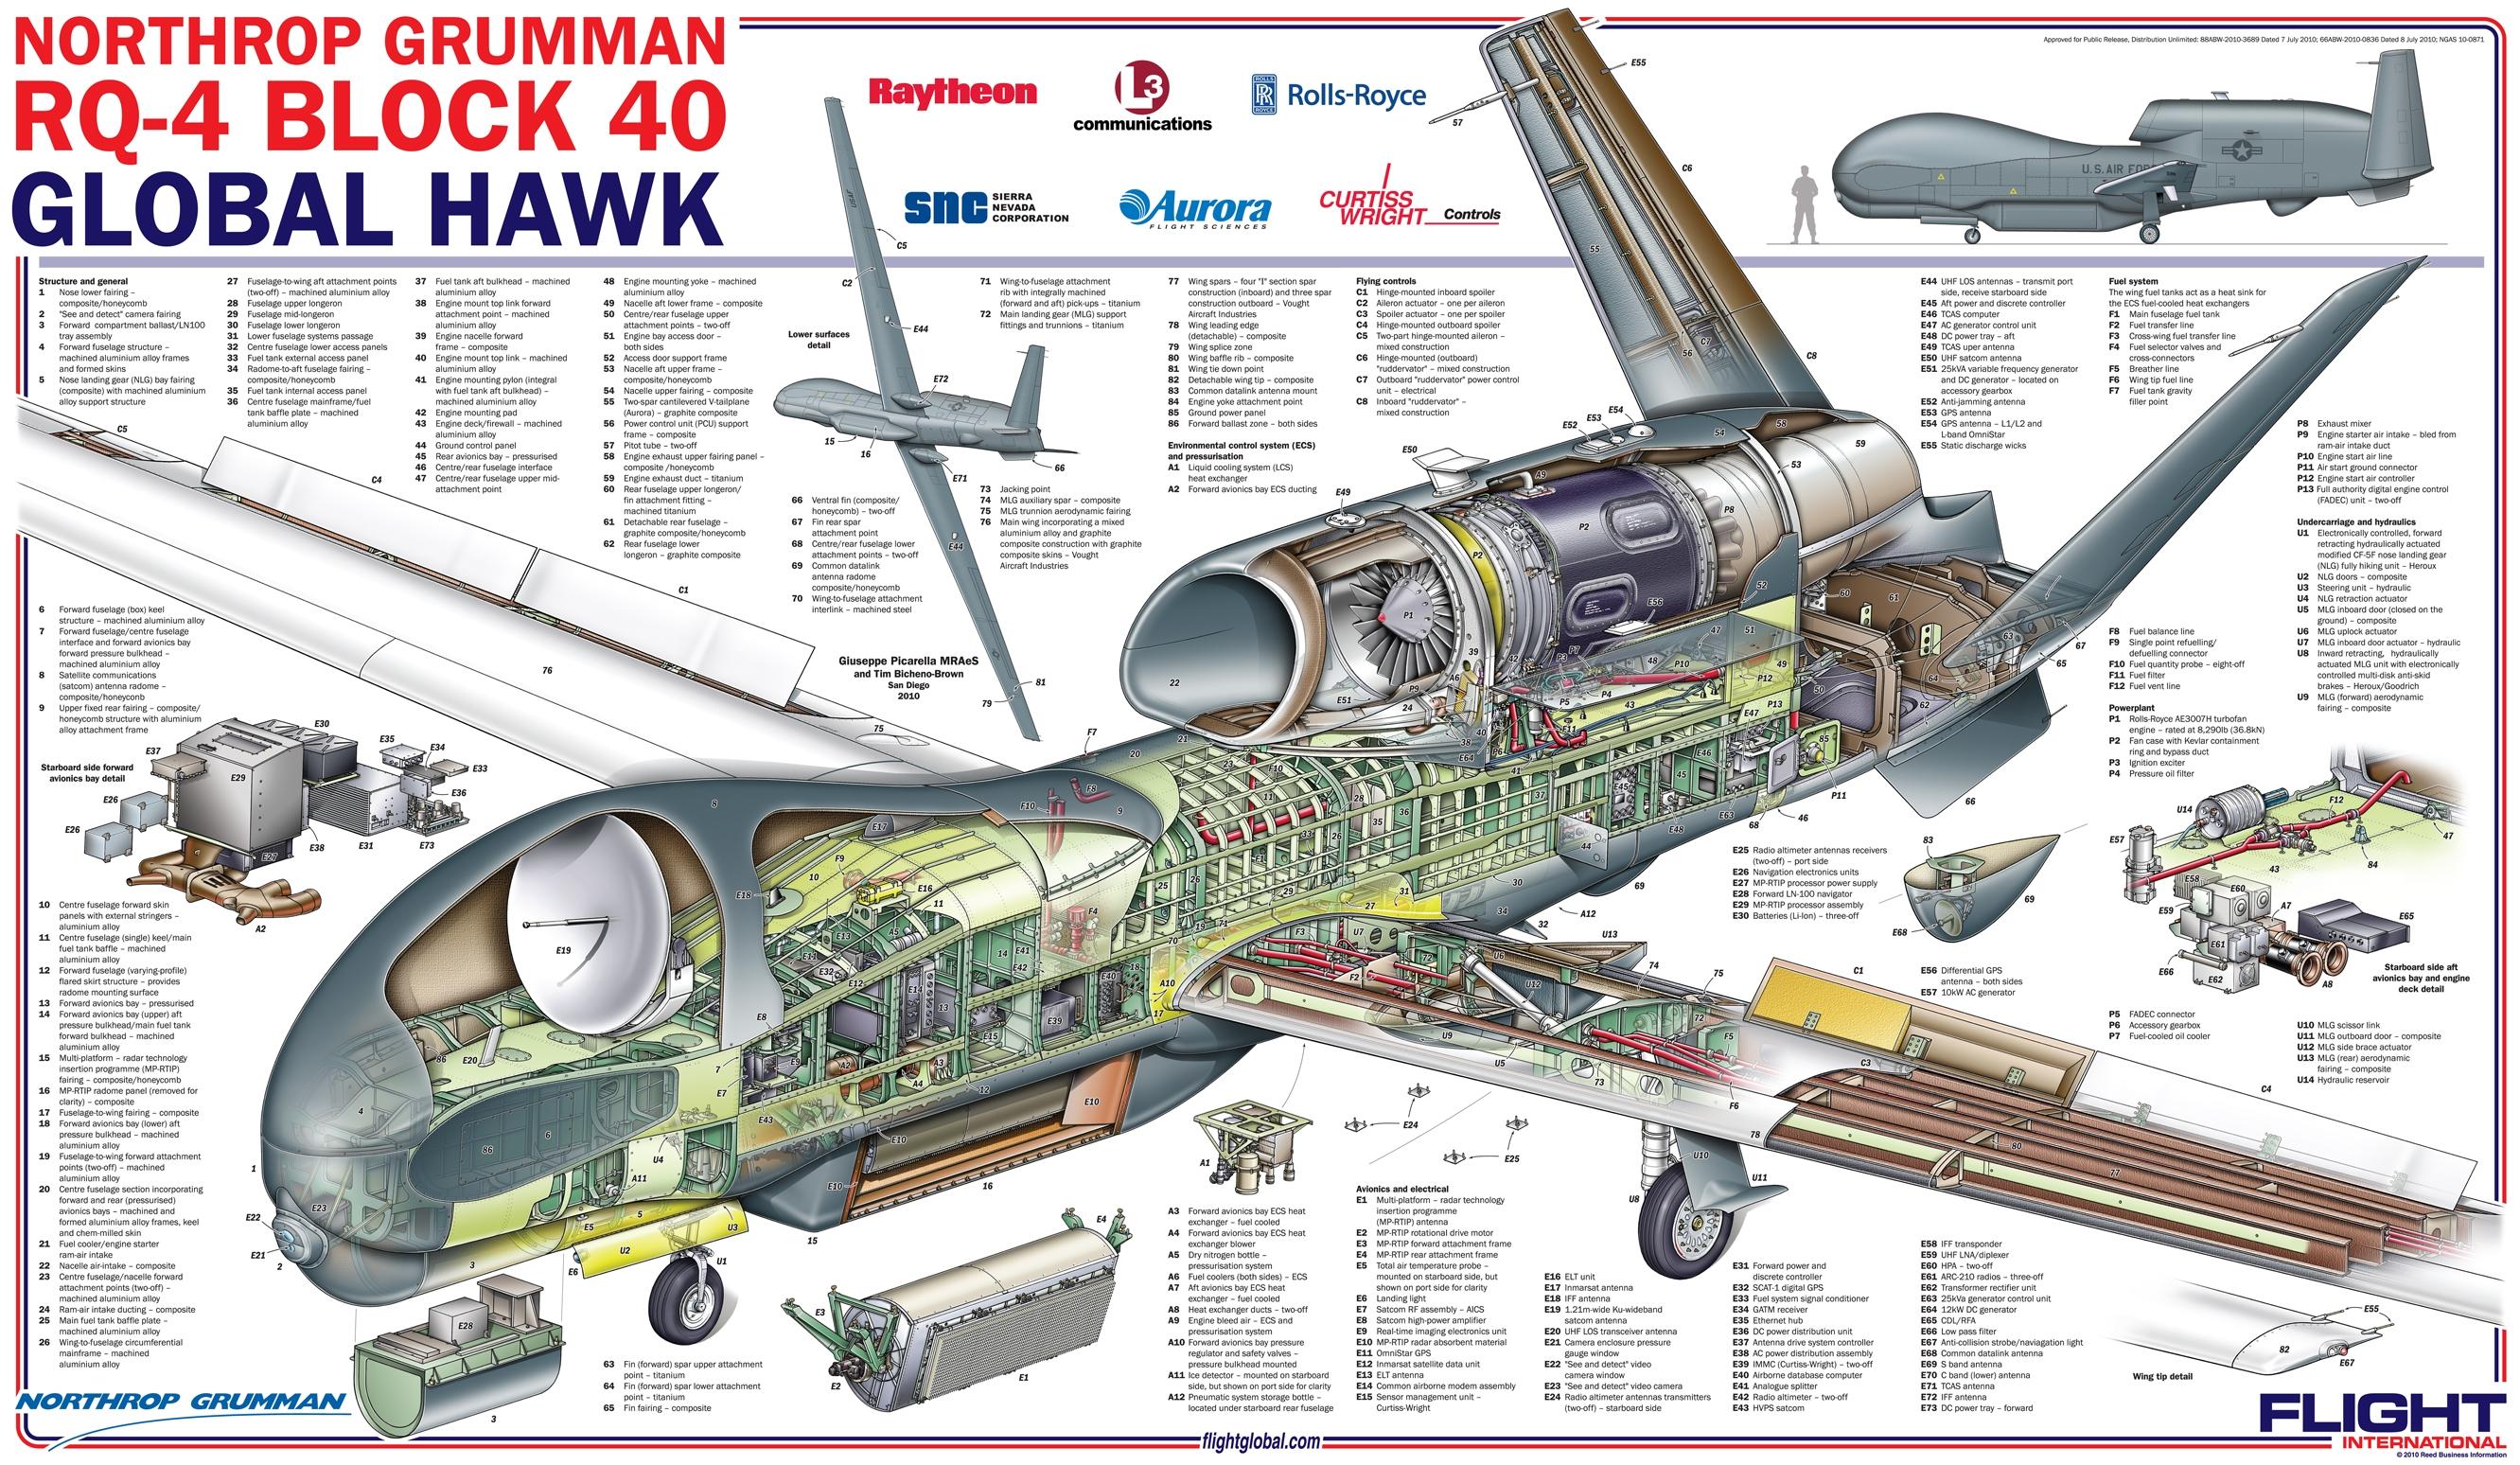 GlobalHawk